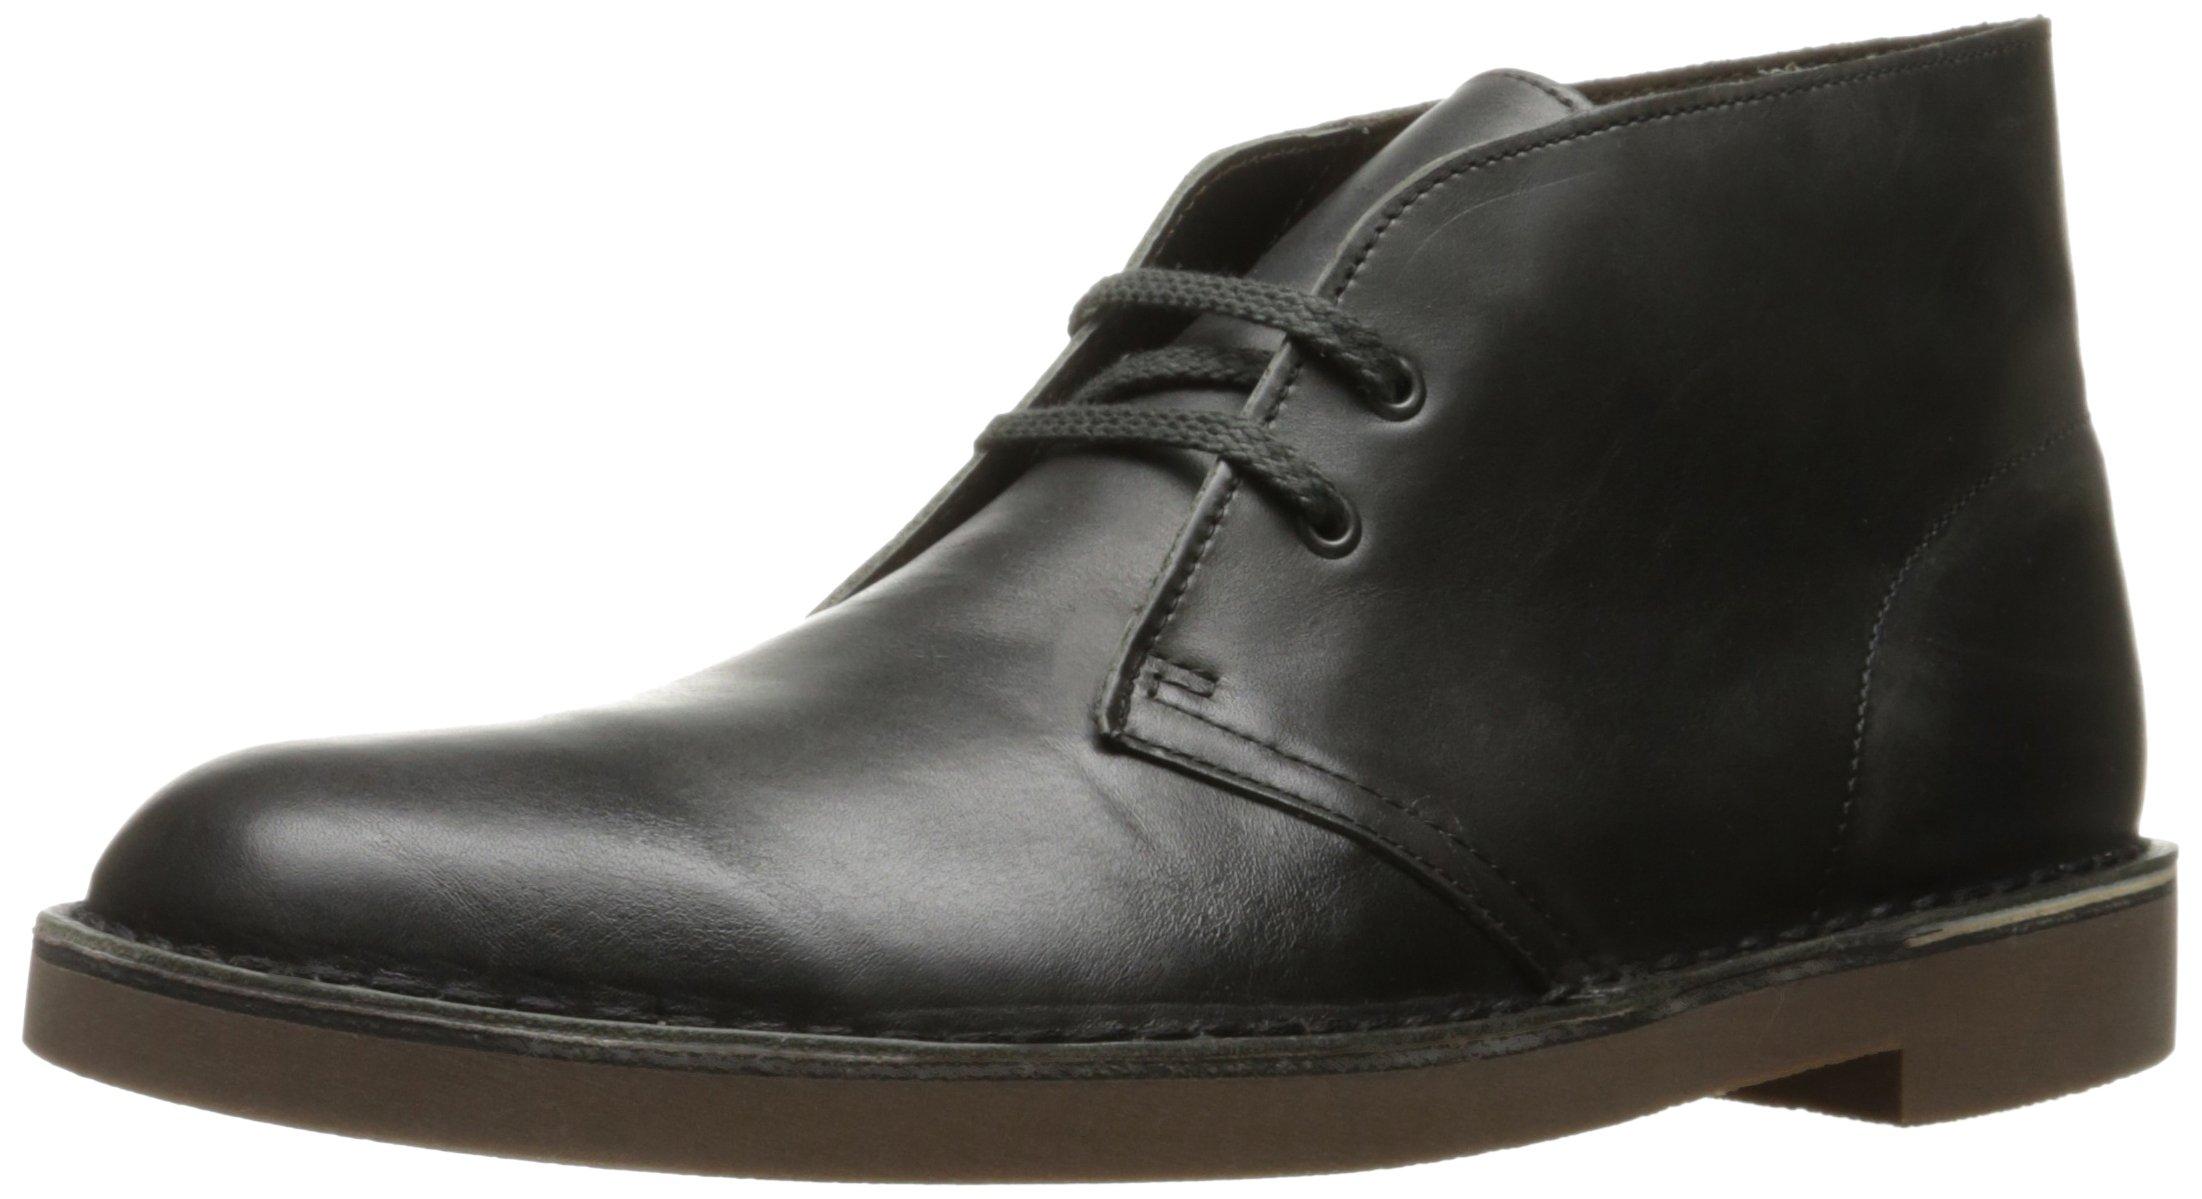 Clarks Men's Bushacre 2 Chukka Boot, Black Smooth, 9 M US